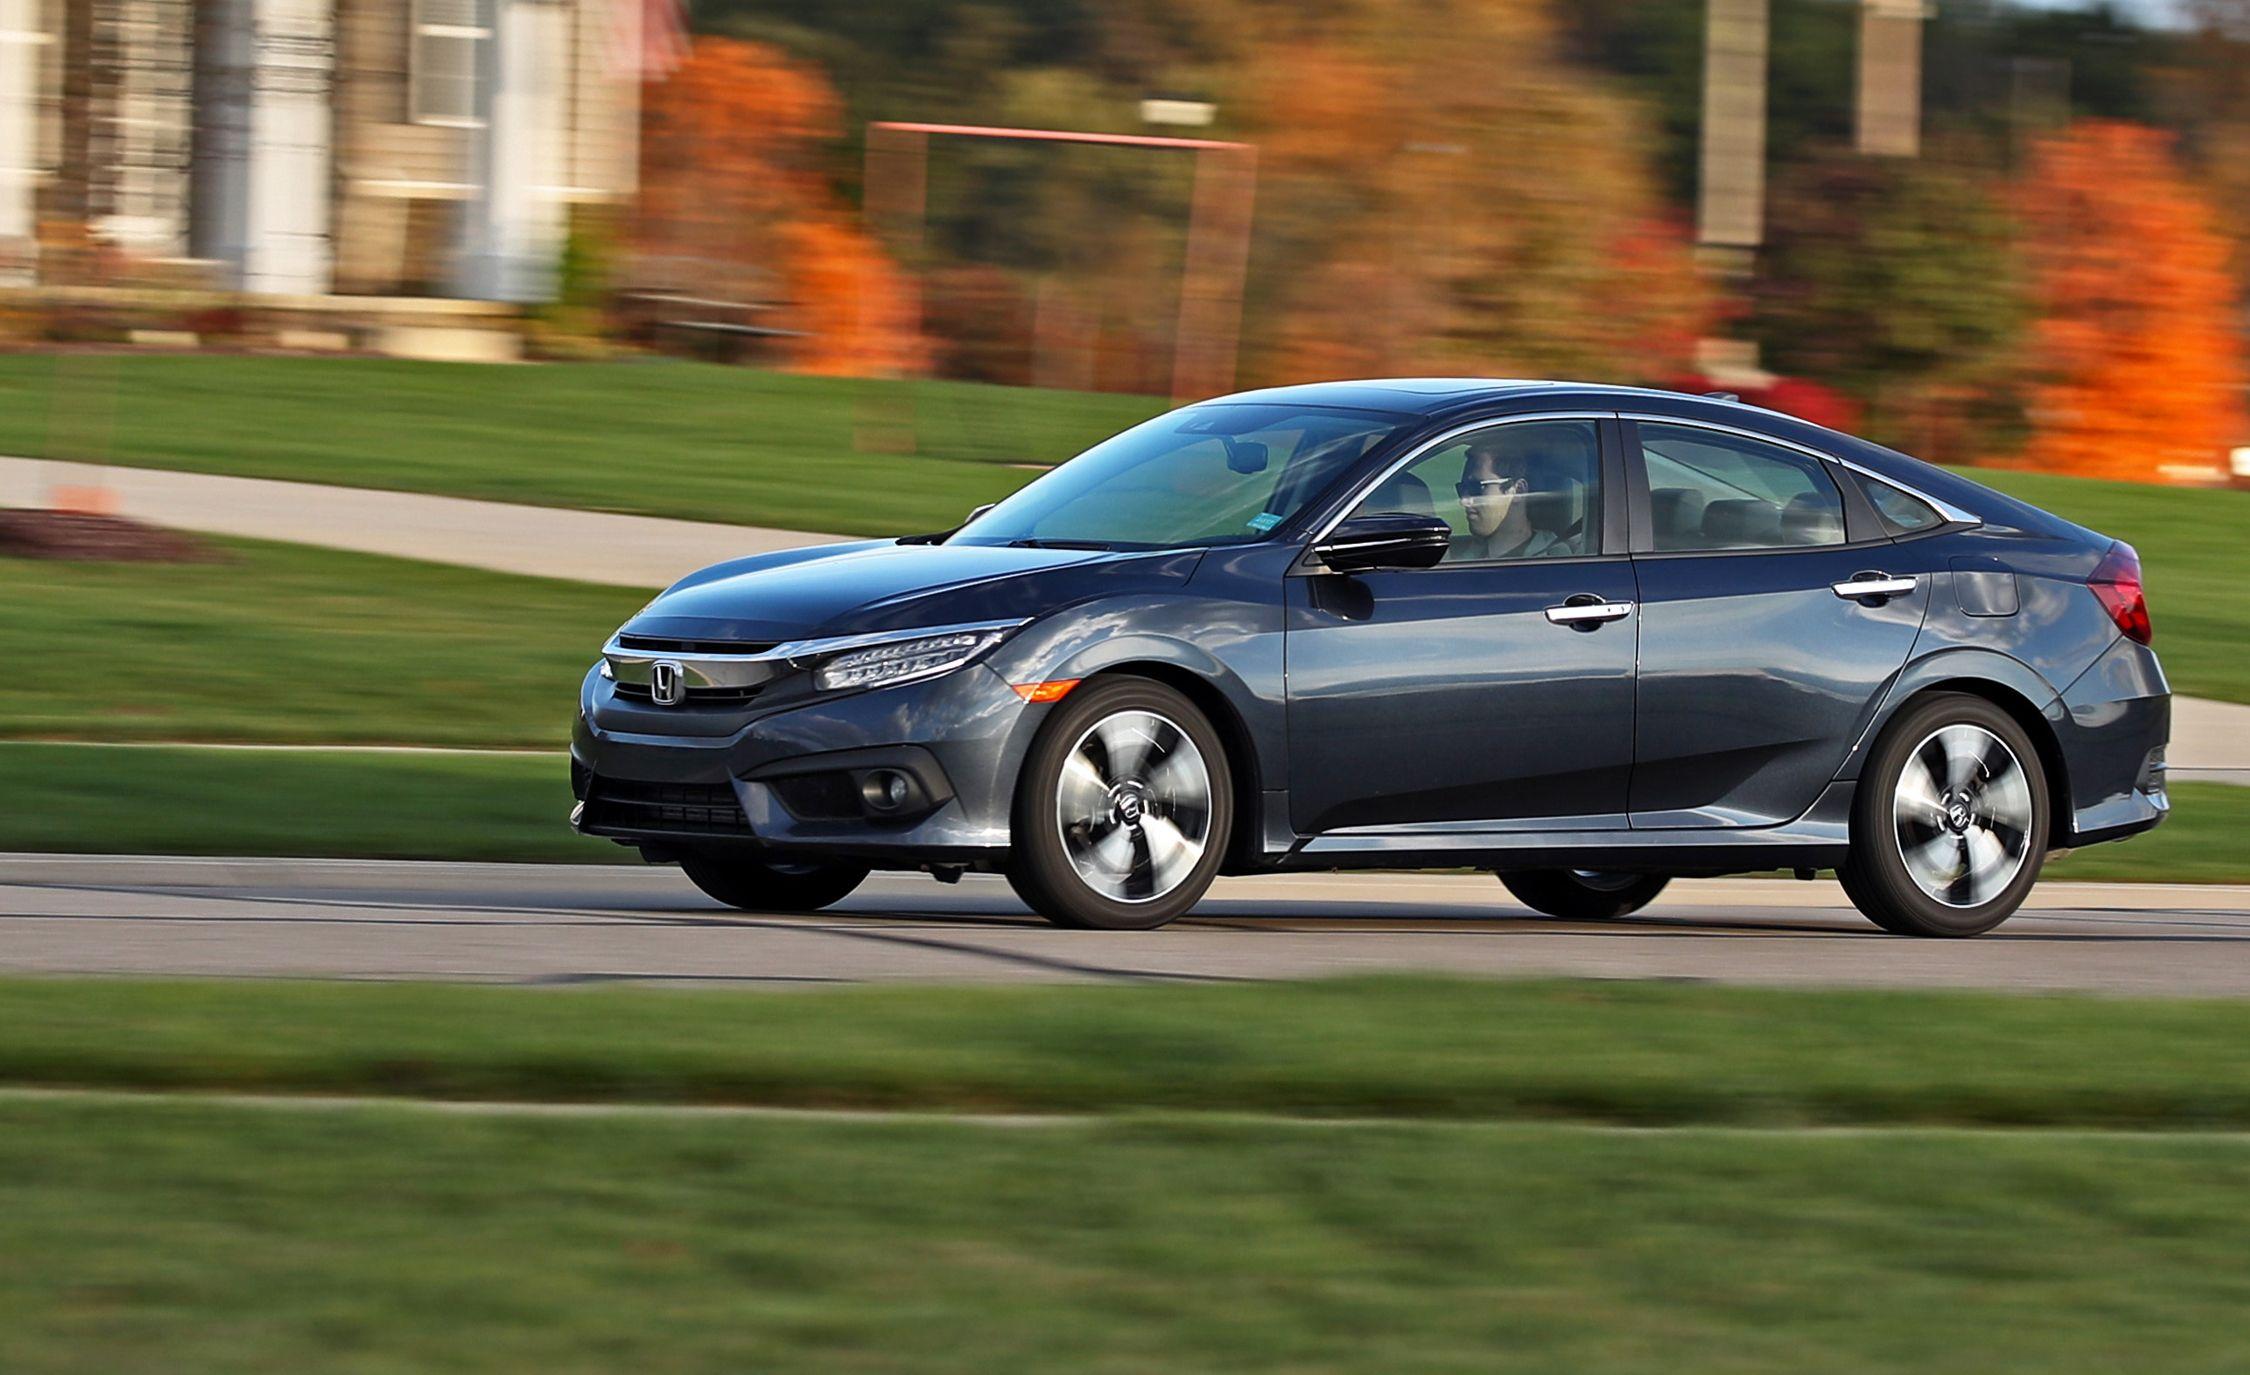 2016 honda civic sedan long term test review car and driver 2006 Honda Civic DX